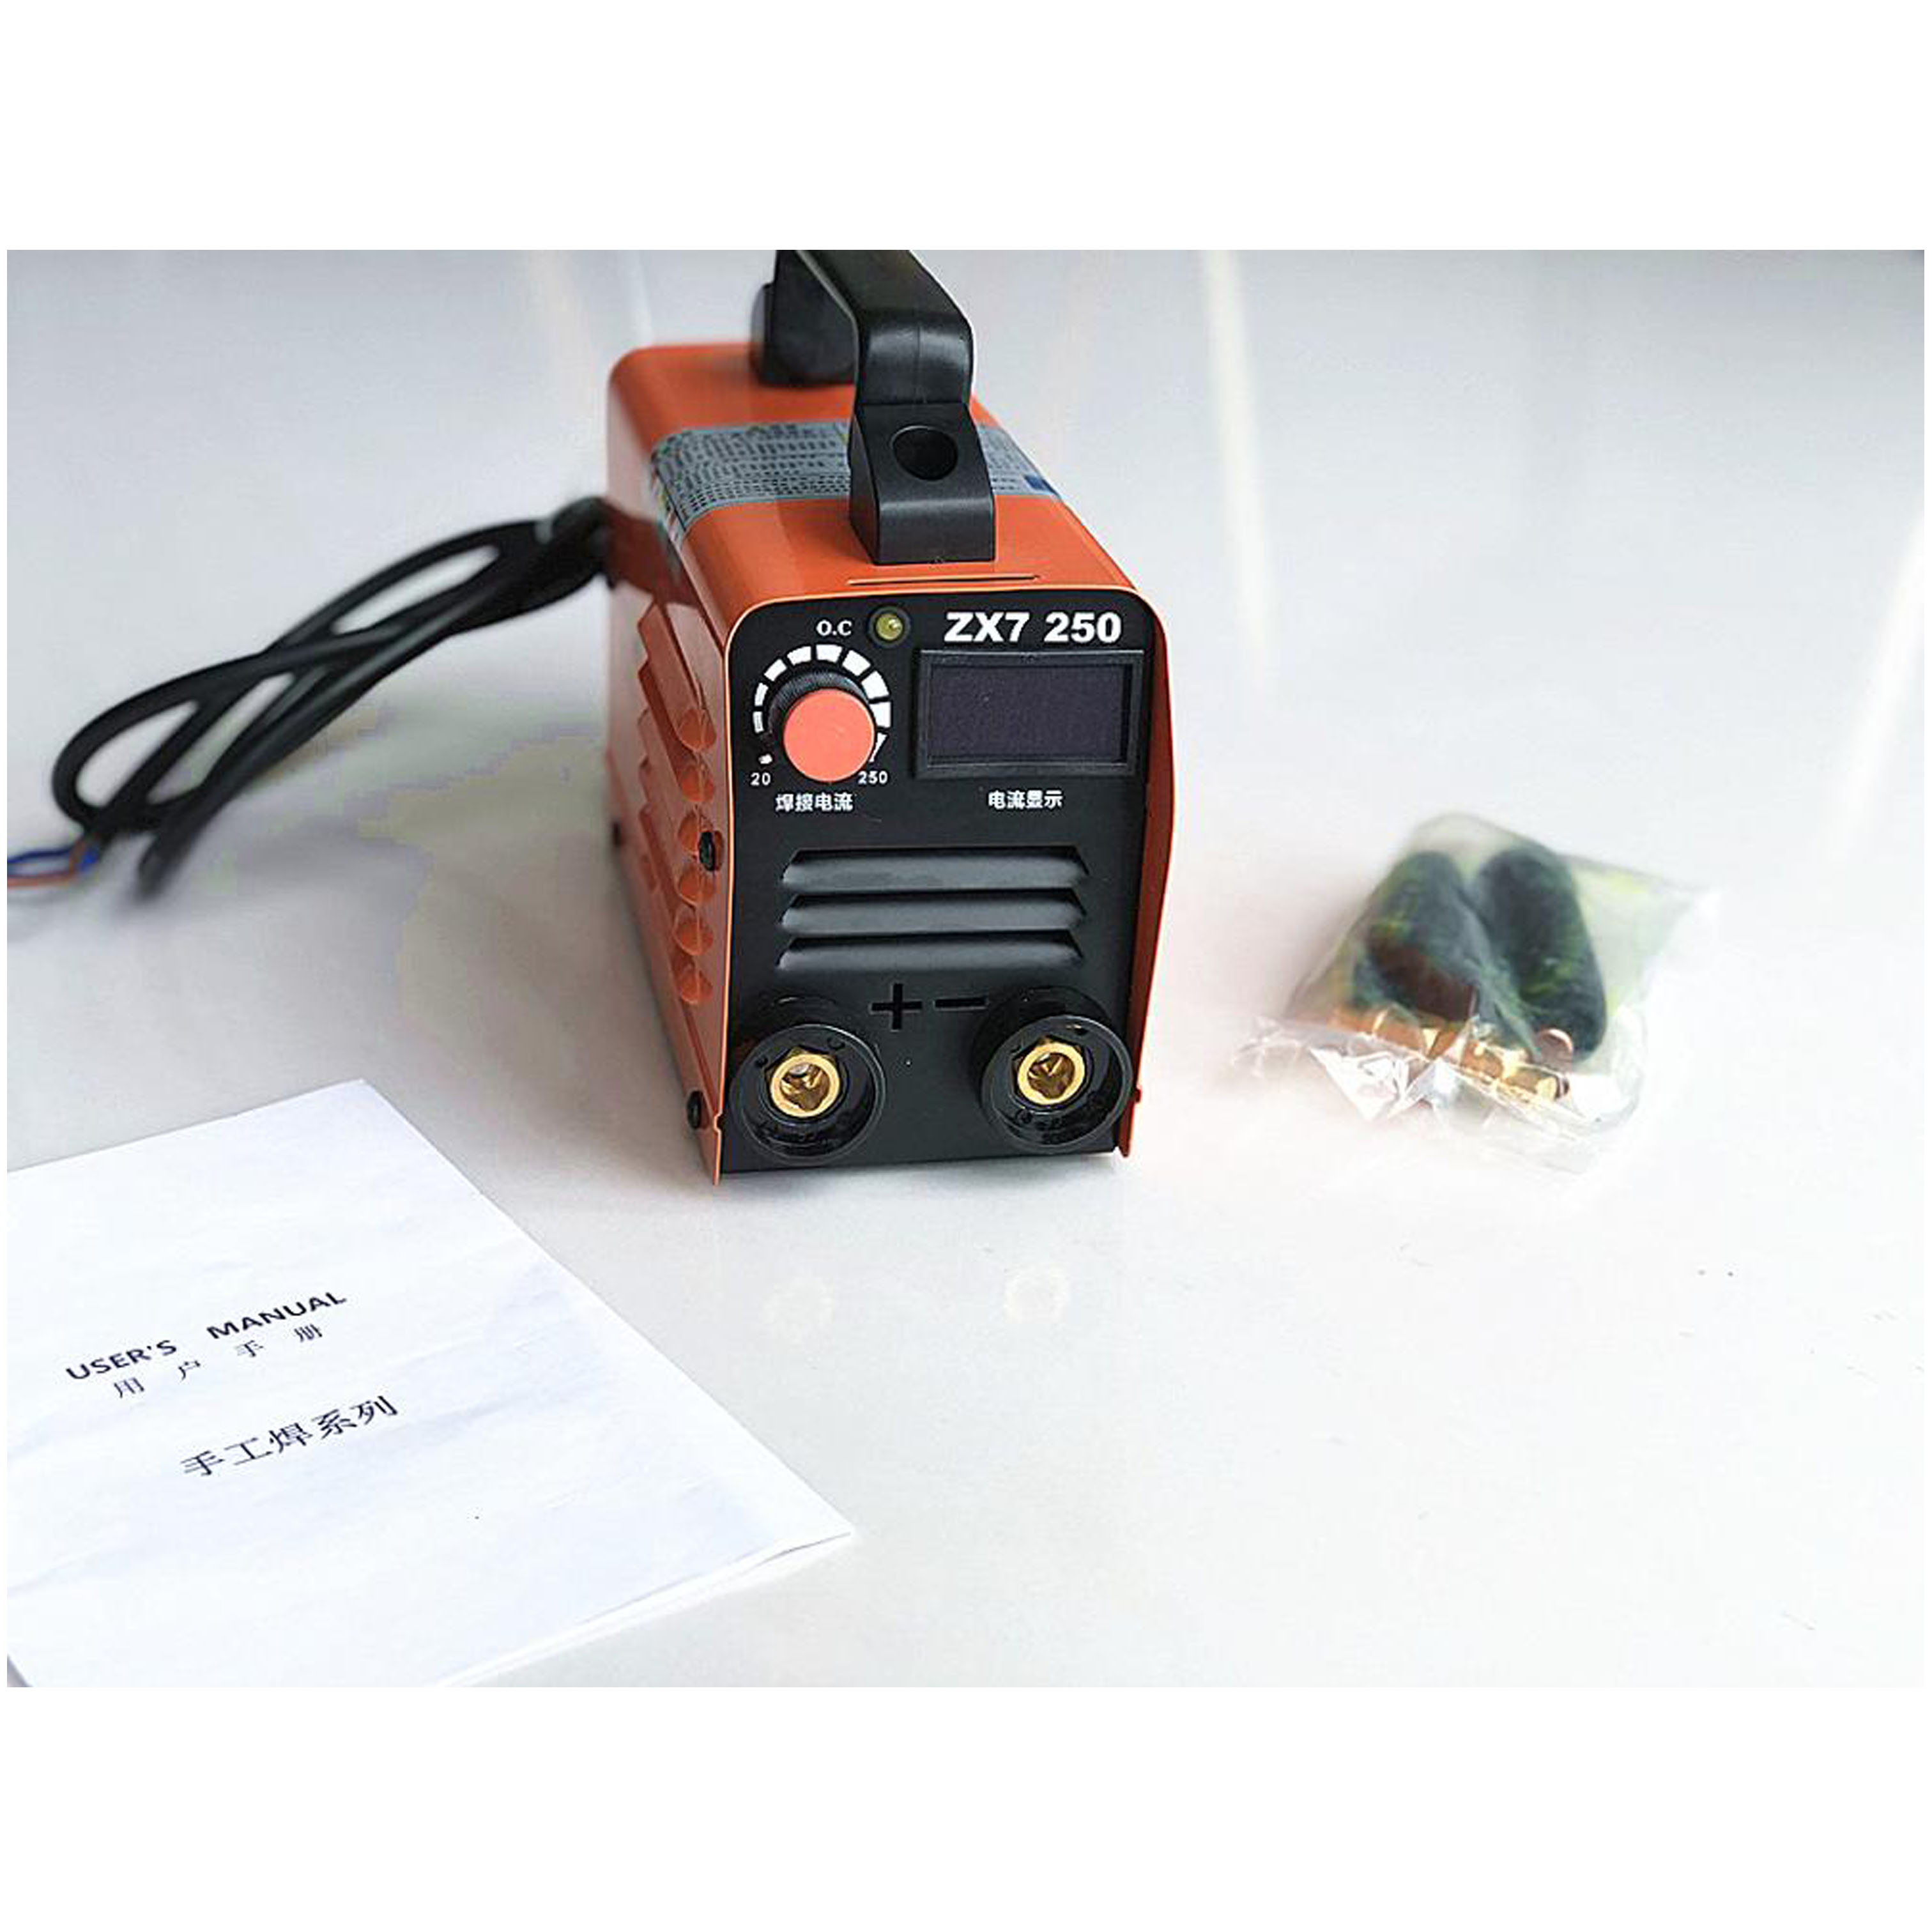 RU Delivery For free 250A 110-250V Compact Mini MMA Welder Inverter ARC Welding Machine Stick Welder